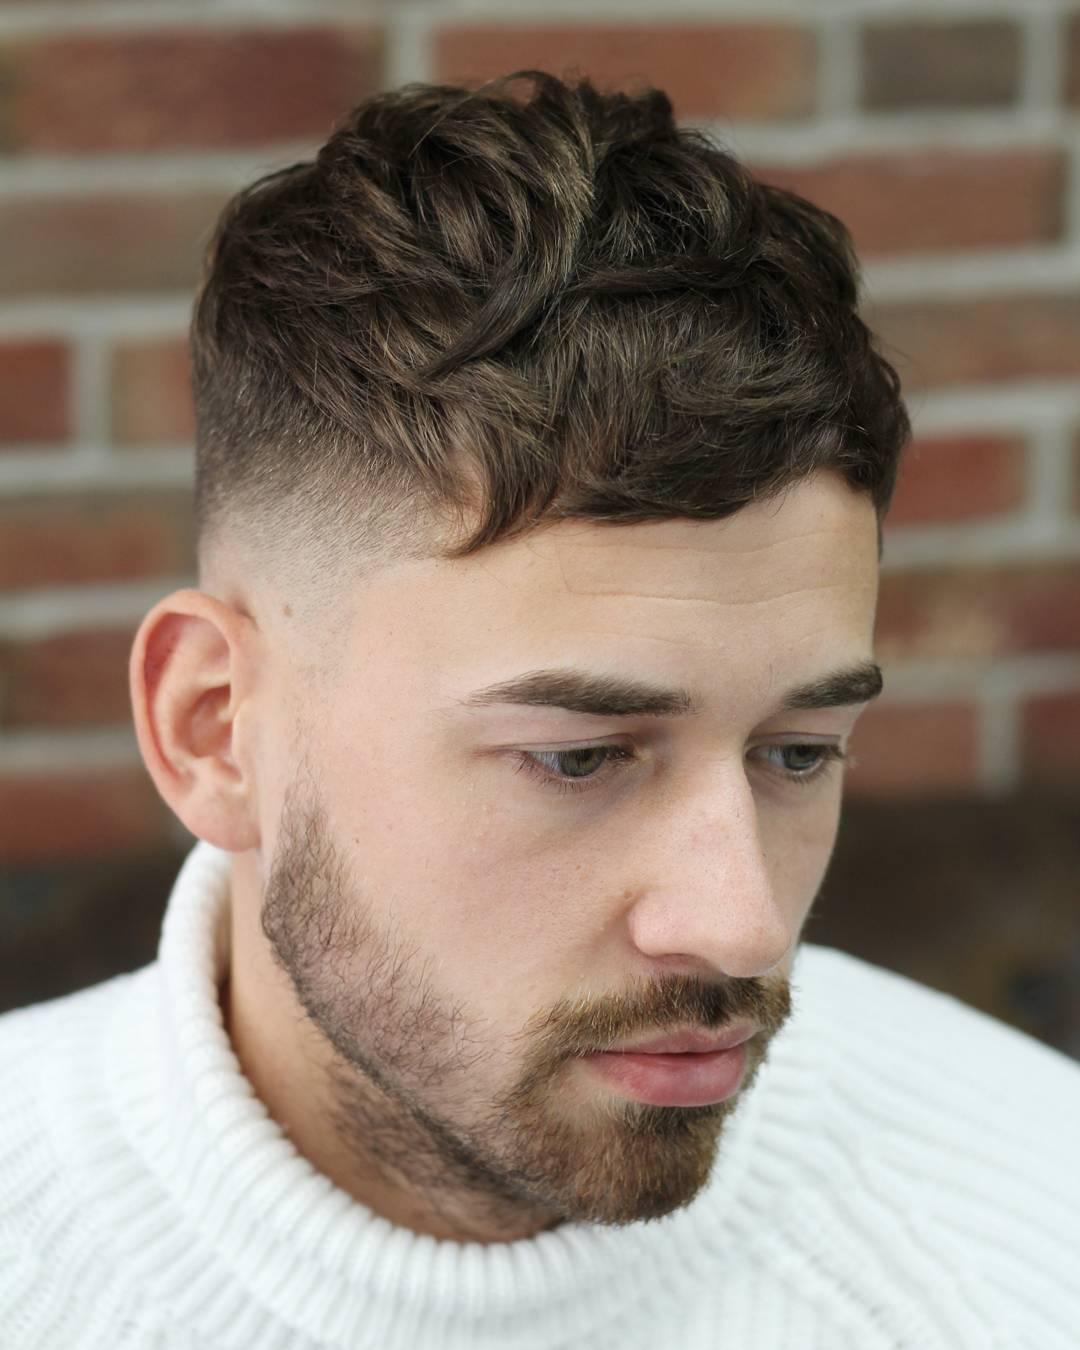 barber_djirlauw-messy-mens-short-haircut